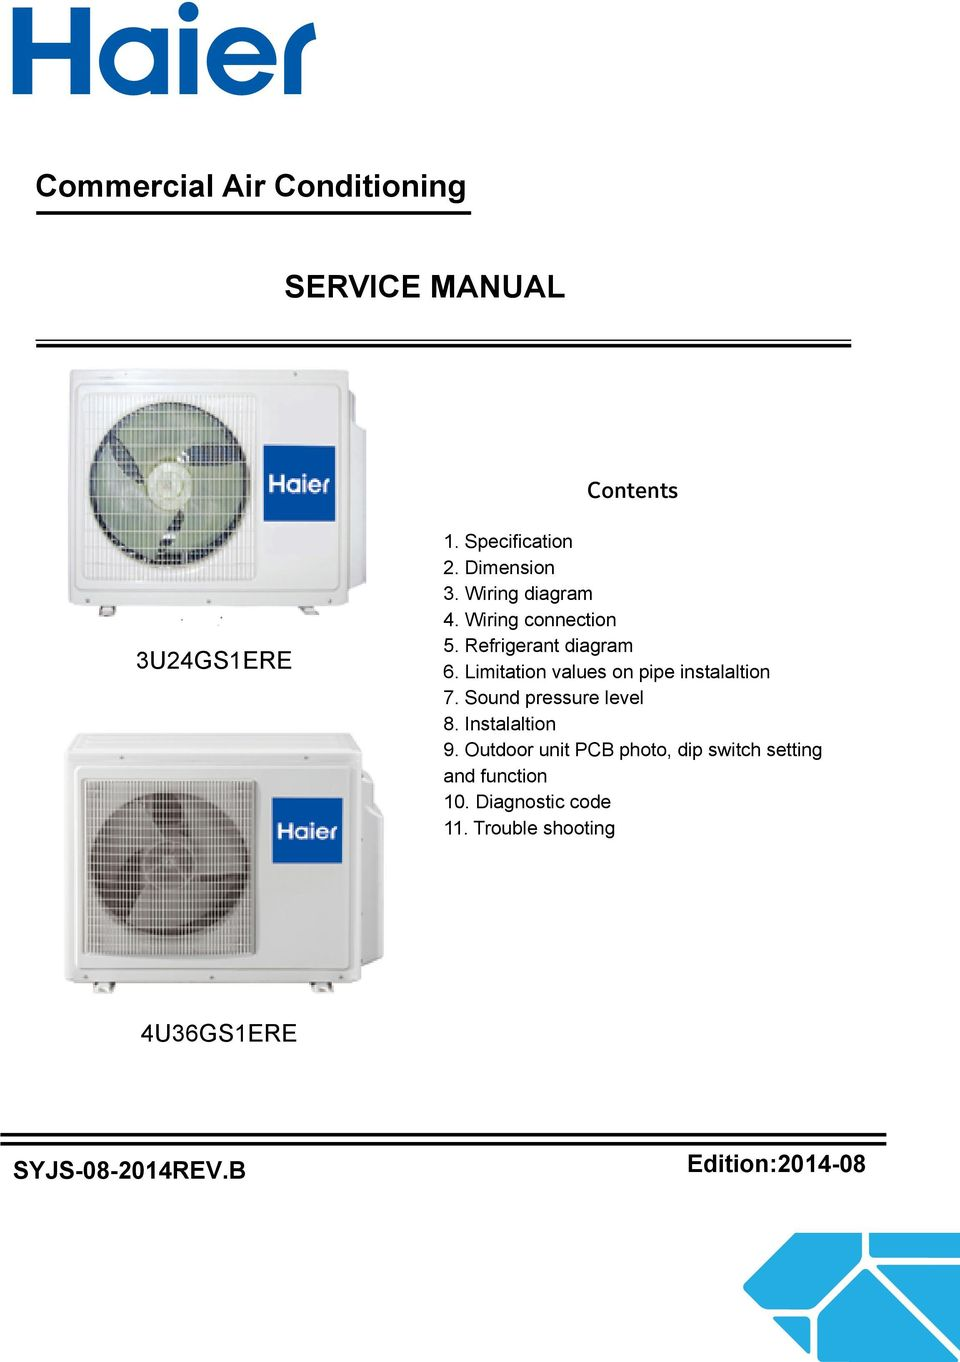 hight resolution of limitation values on pipe instalaltion 7 sound pressure level 8 instalaltion 9